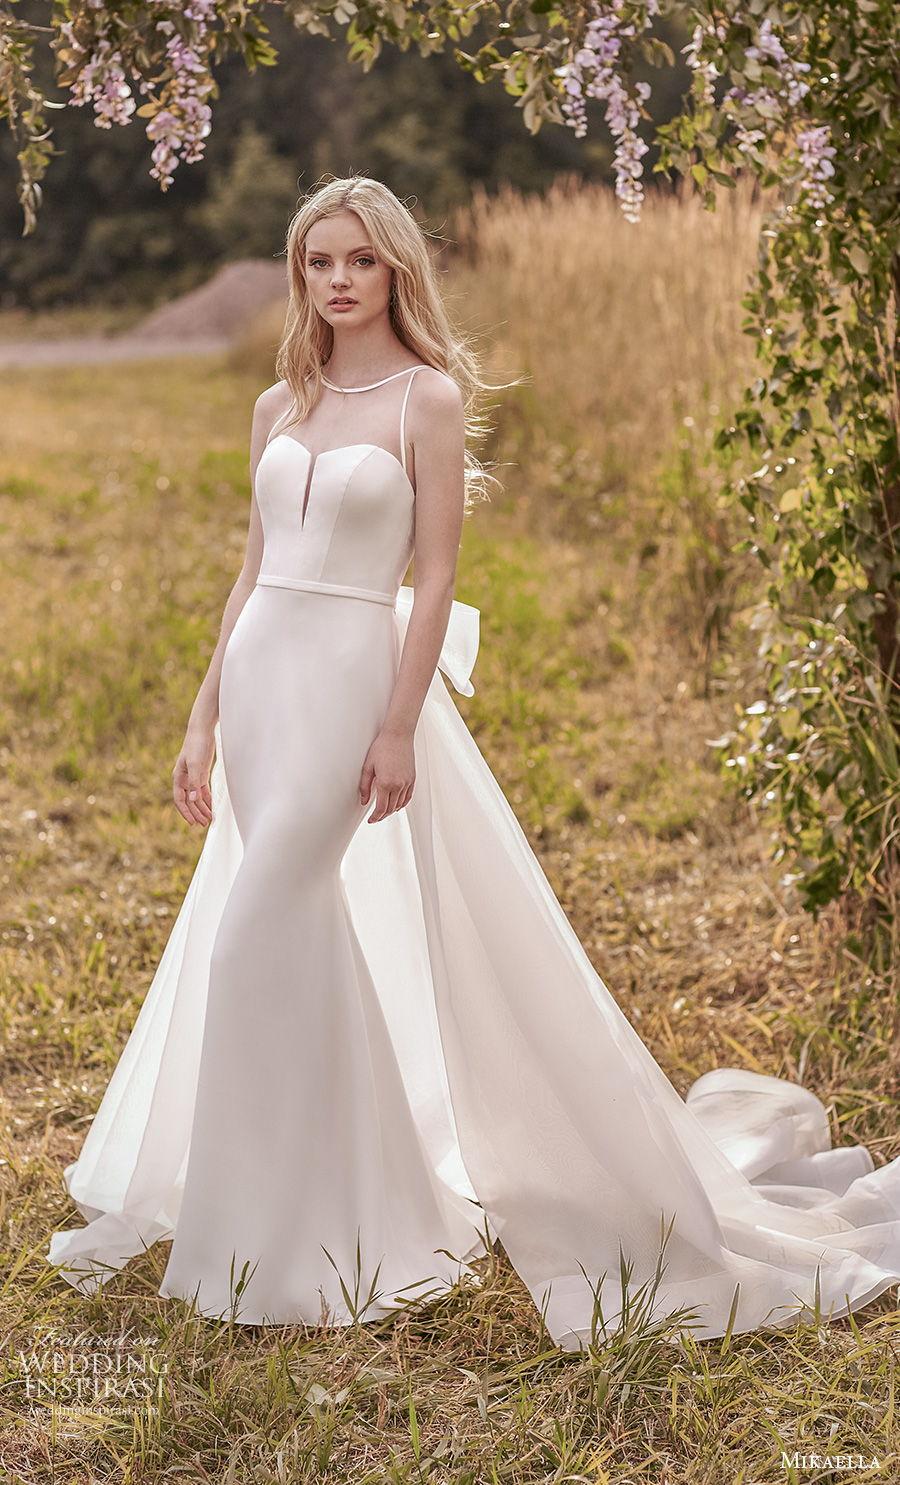 mikaella spring 2020 bridal sleeveless illusion bateau sweetheart neckline simple minimalist elegant fit and flare wedding dress a  line overskirt sheer keyhole back chapel train (1) mv